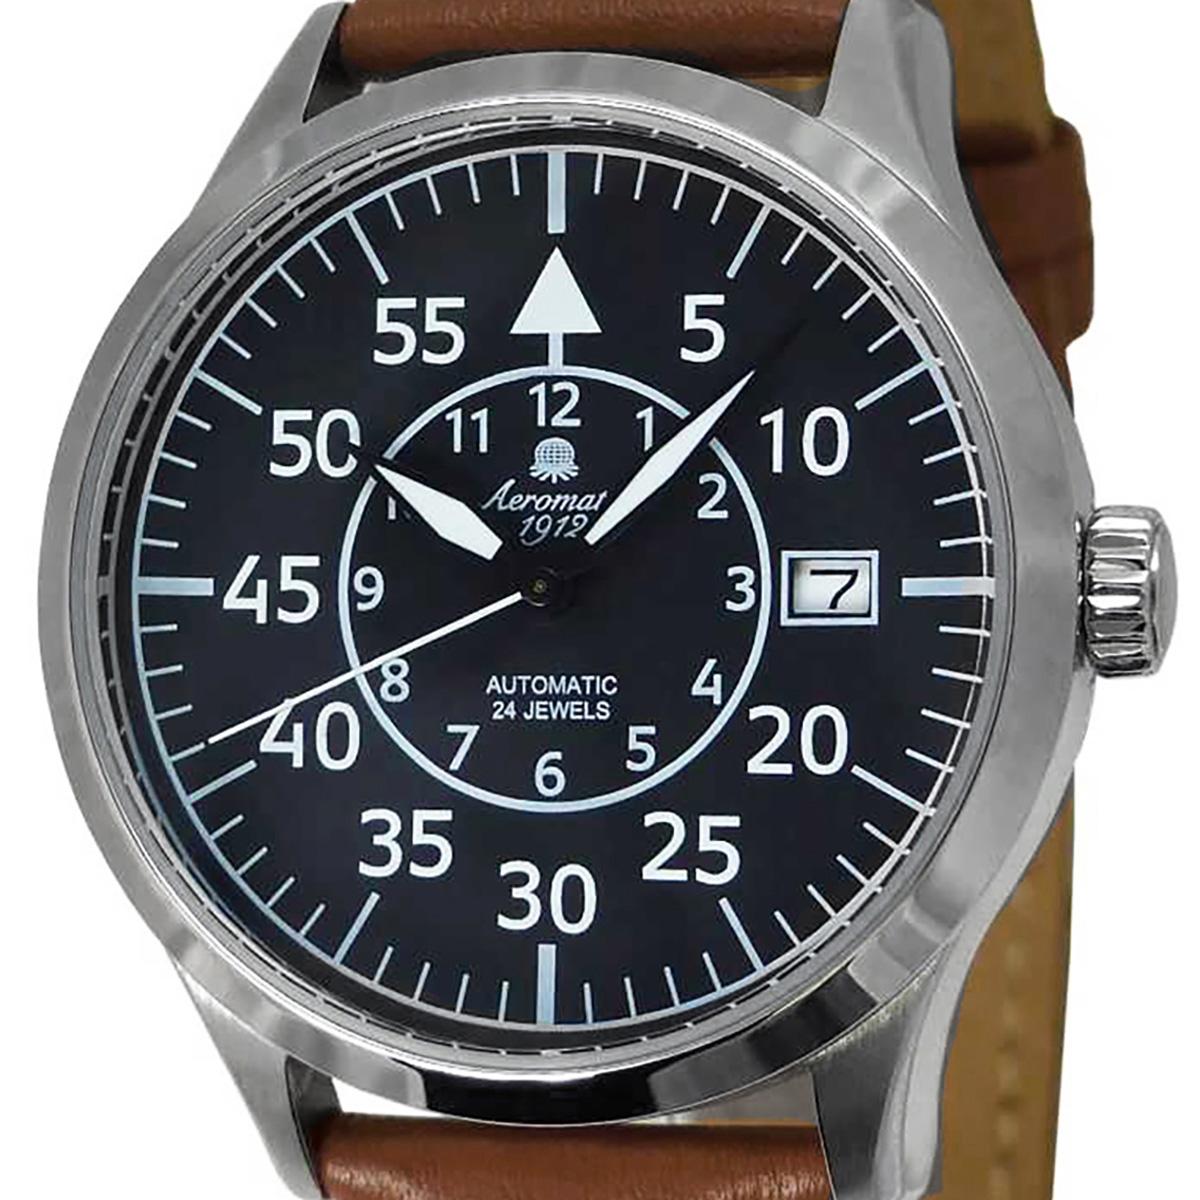 Aeromatic1912 エアロマティック1912 自動巻き(手巻き機能あり) 腕時計 [A1434] 正規代理店品  デイト